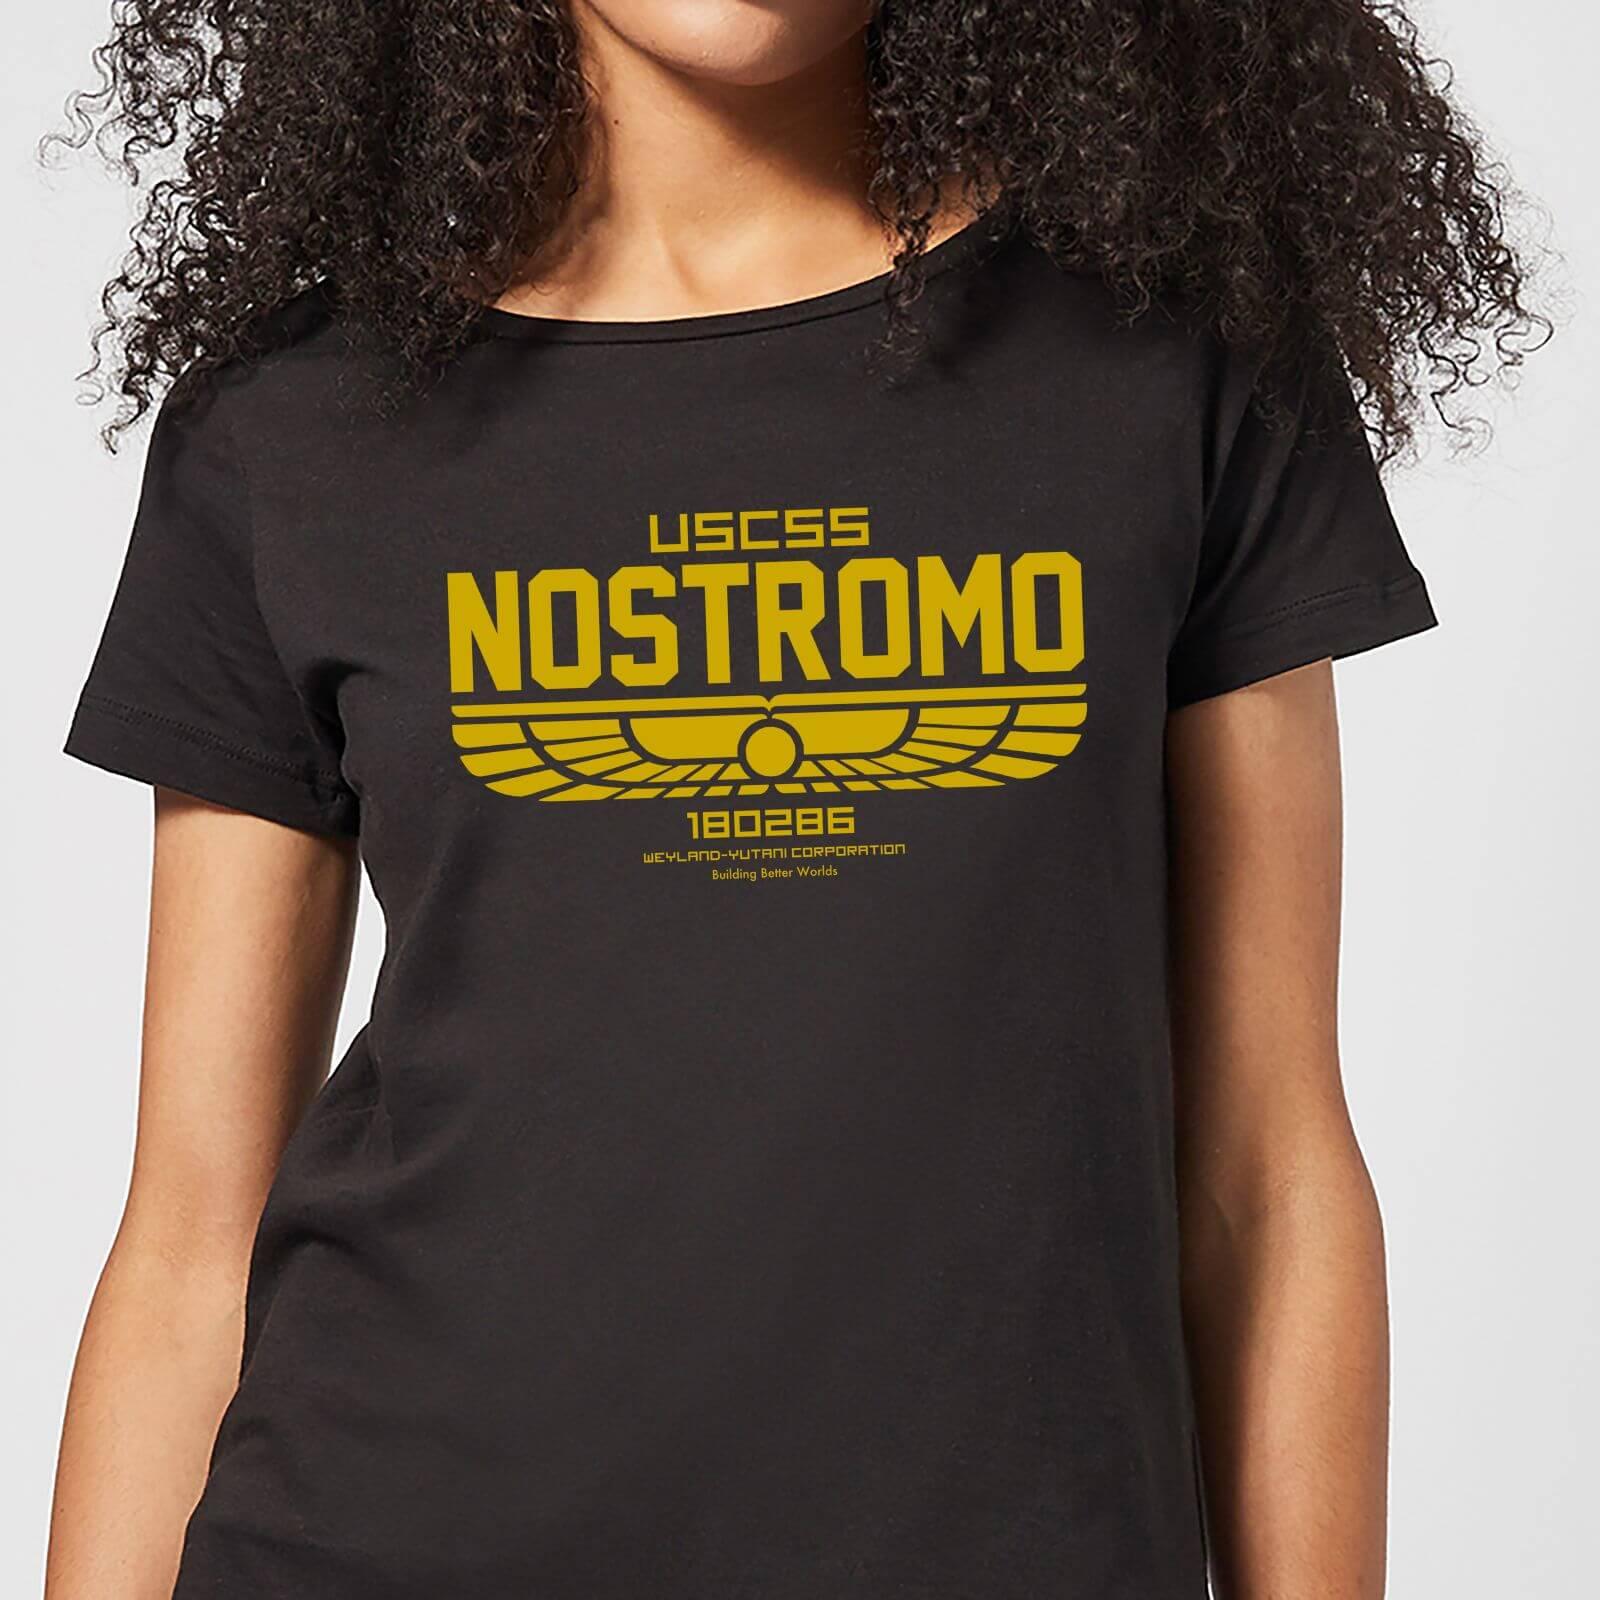 Alien USCSS Nostromo Women's T-Shirt - Black - M - Black